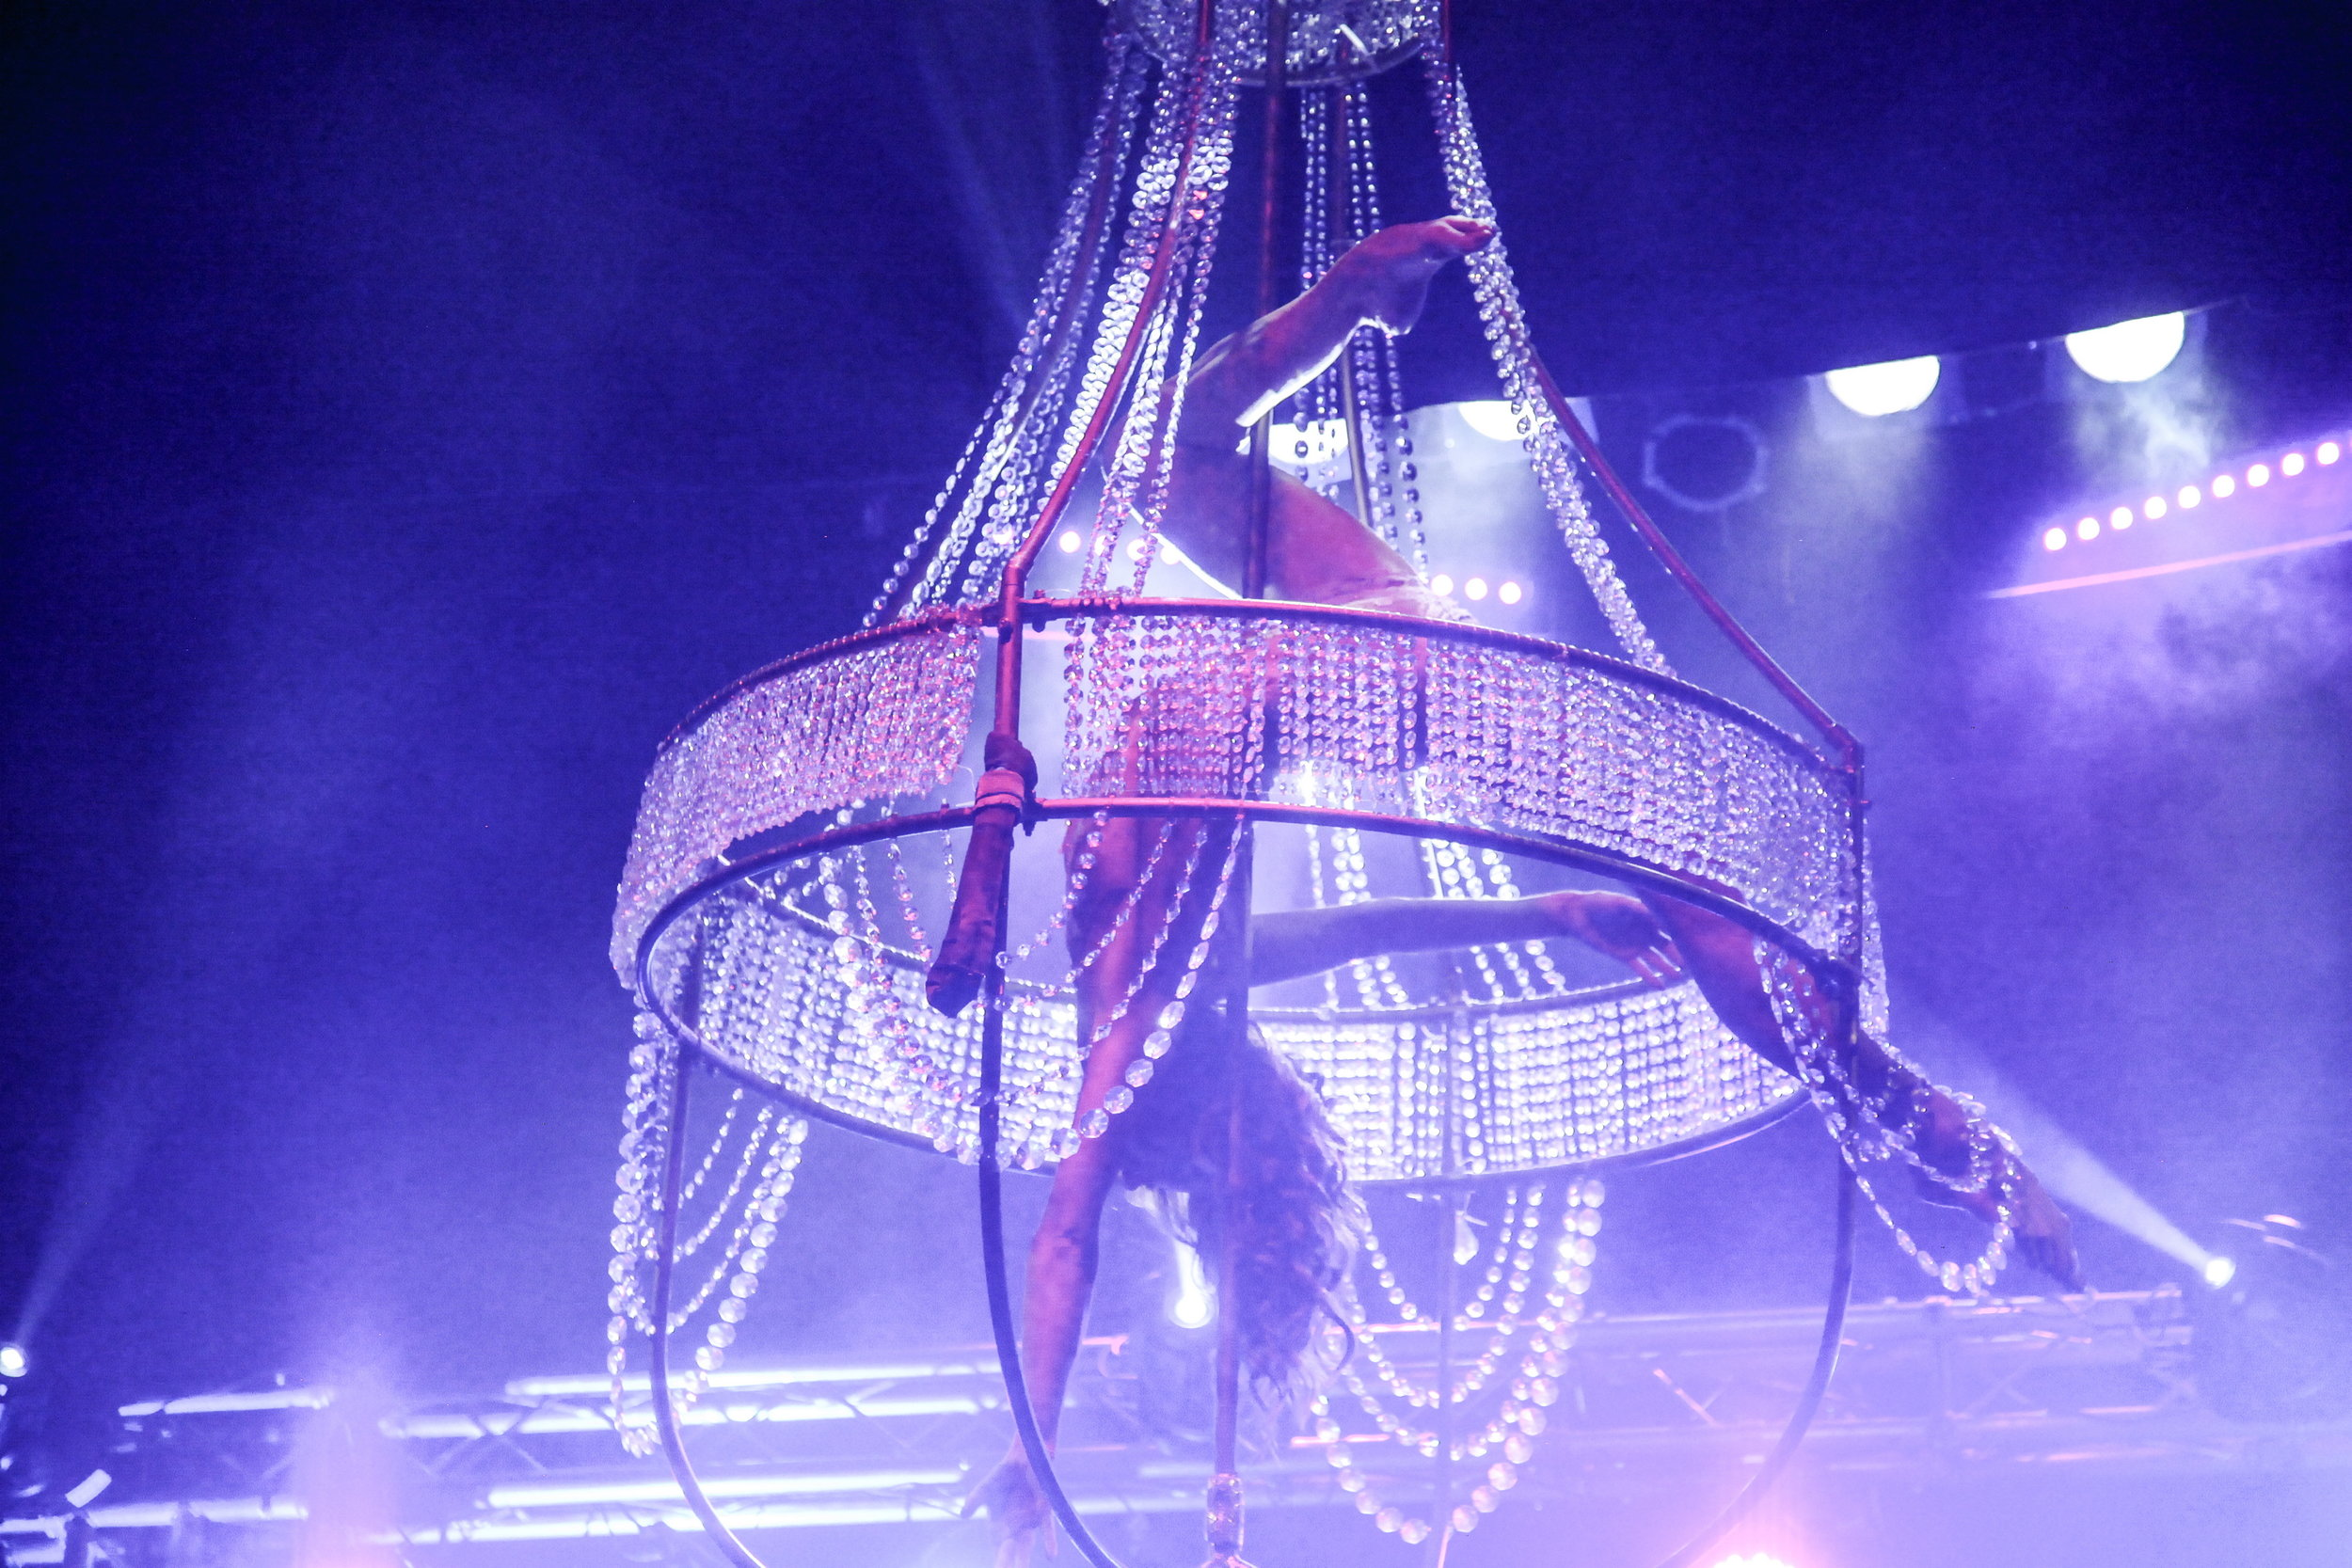 Kronleuchter Luftakrobatik Supertalent - Air Candy Aerial Chandelier